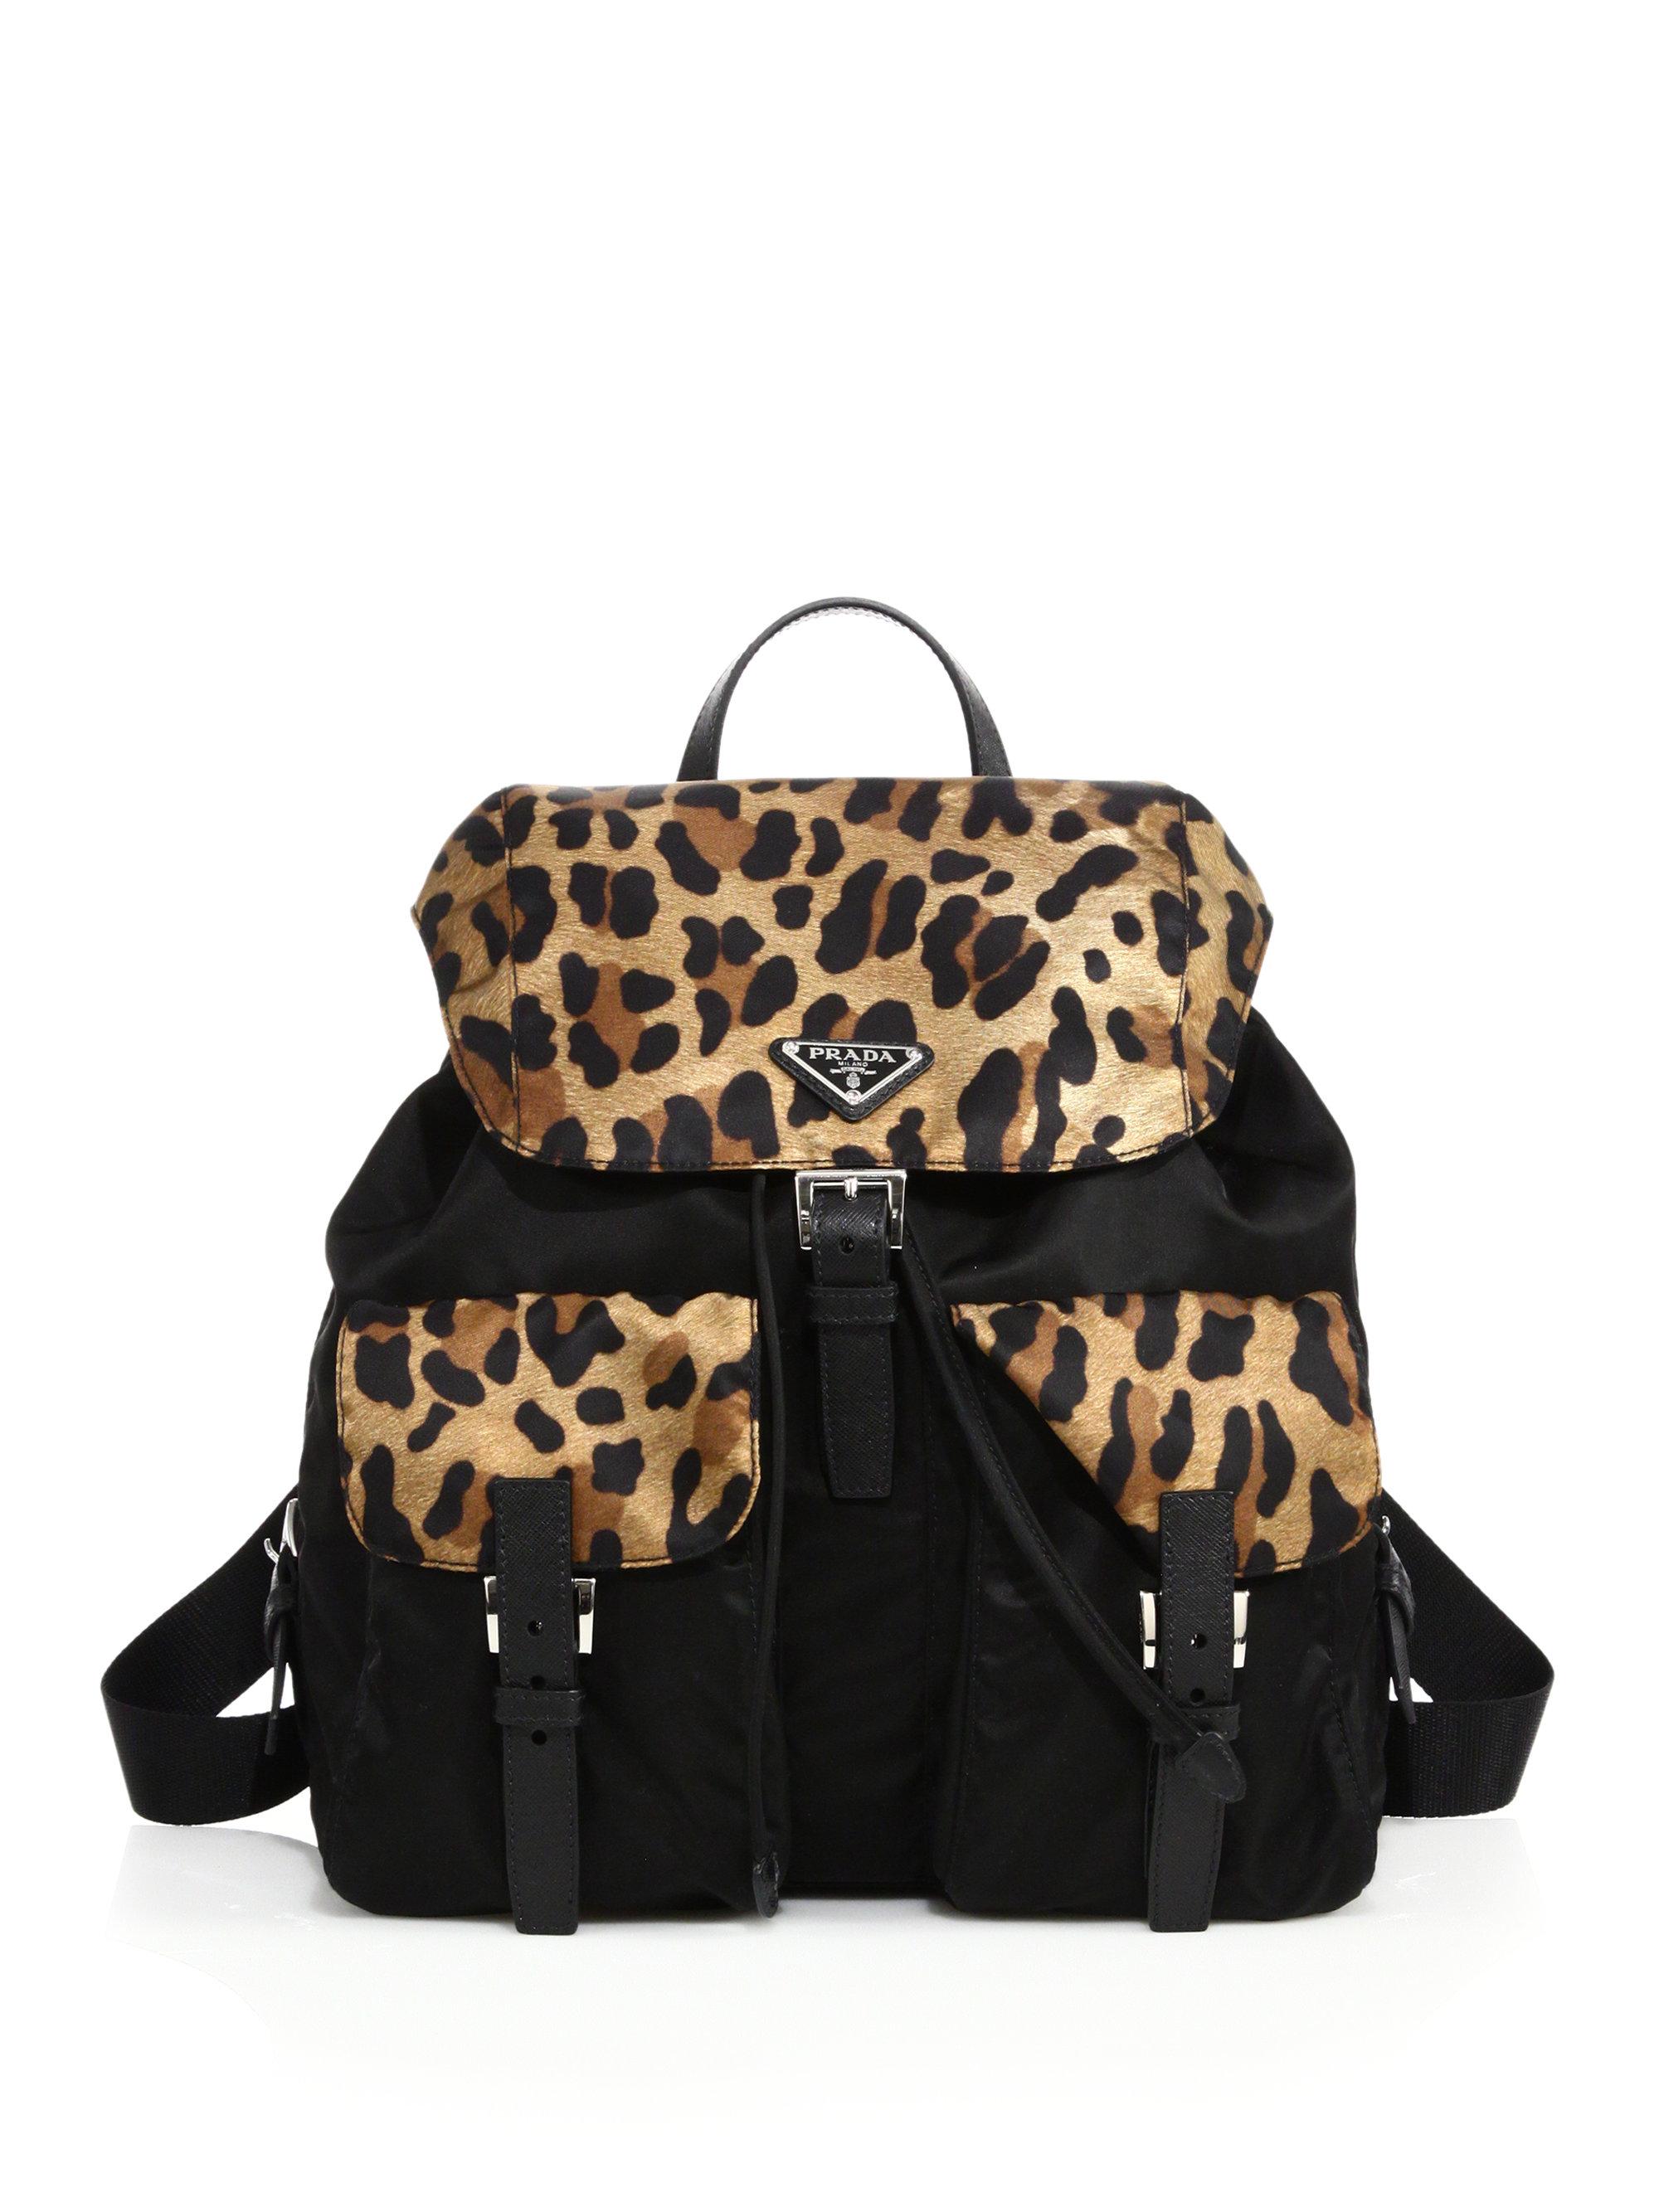 5fee359f41cd ireland lyst prada leopard print nylon backpack in black 77196 41bcc